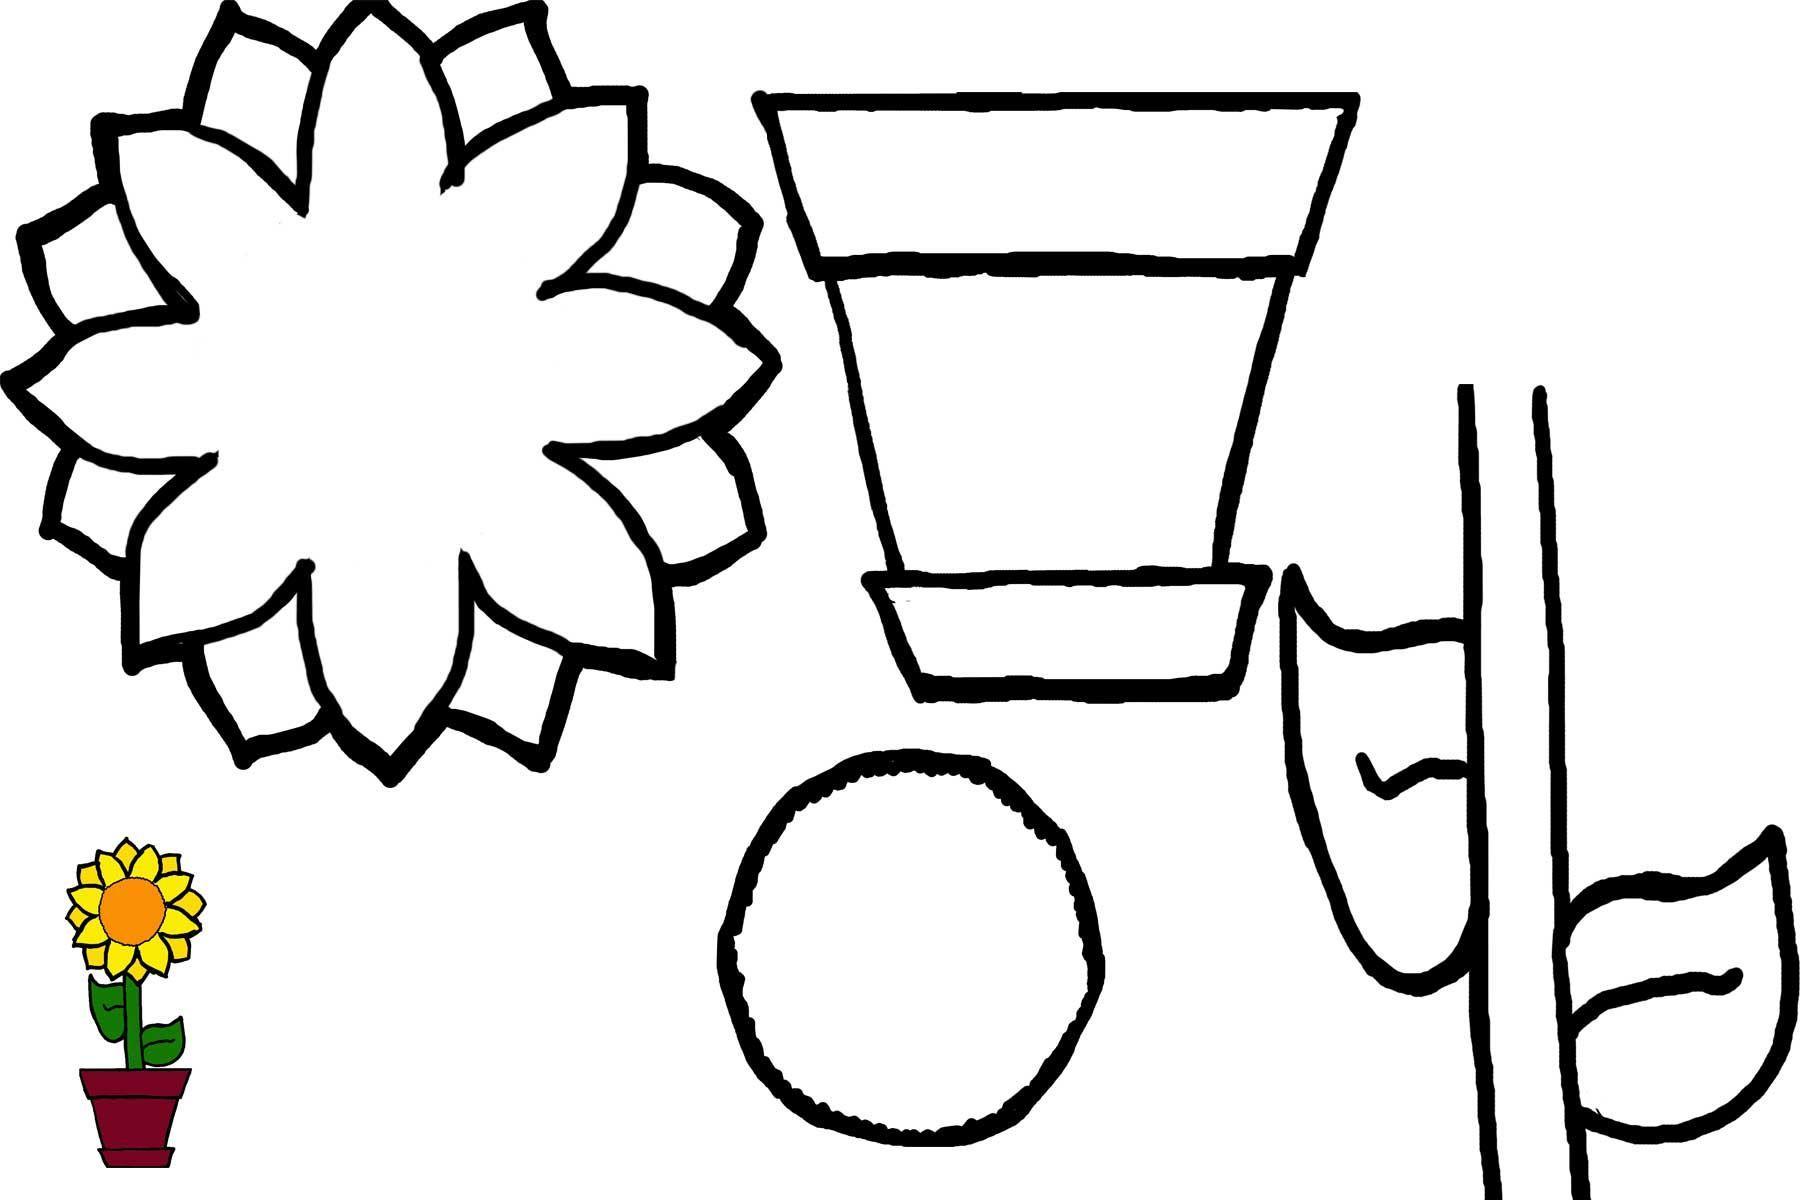 Preschool Worksheets On Plants 4